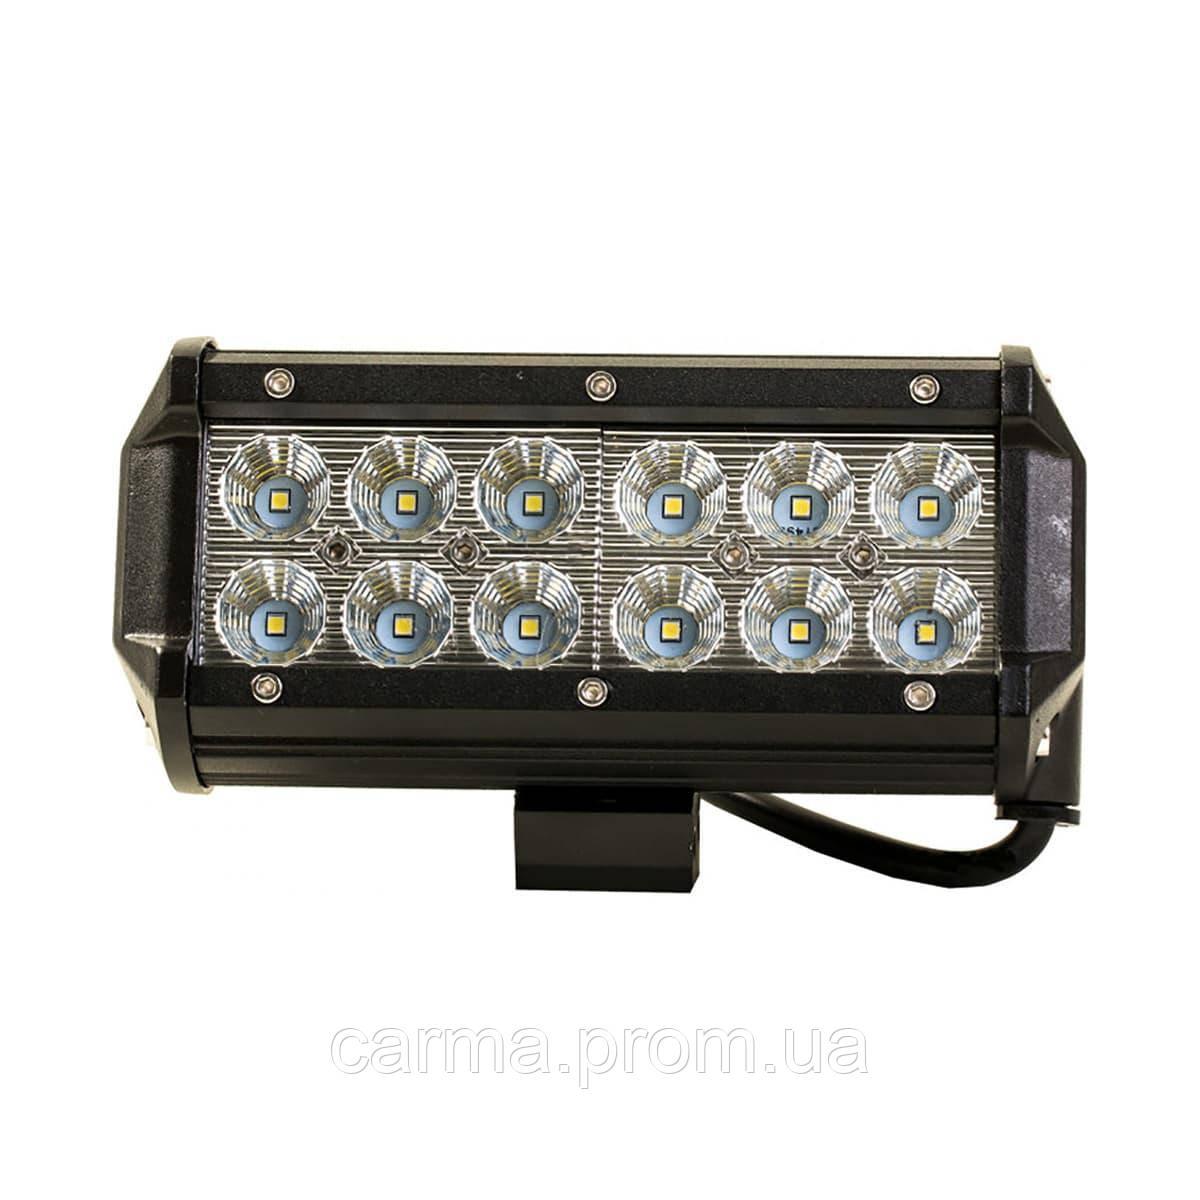 Автофара LED на крышу 5D-36W-SPOT Черный